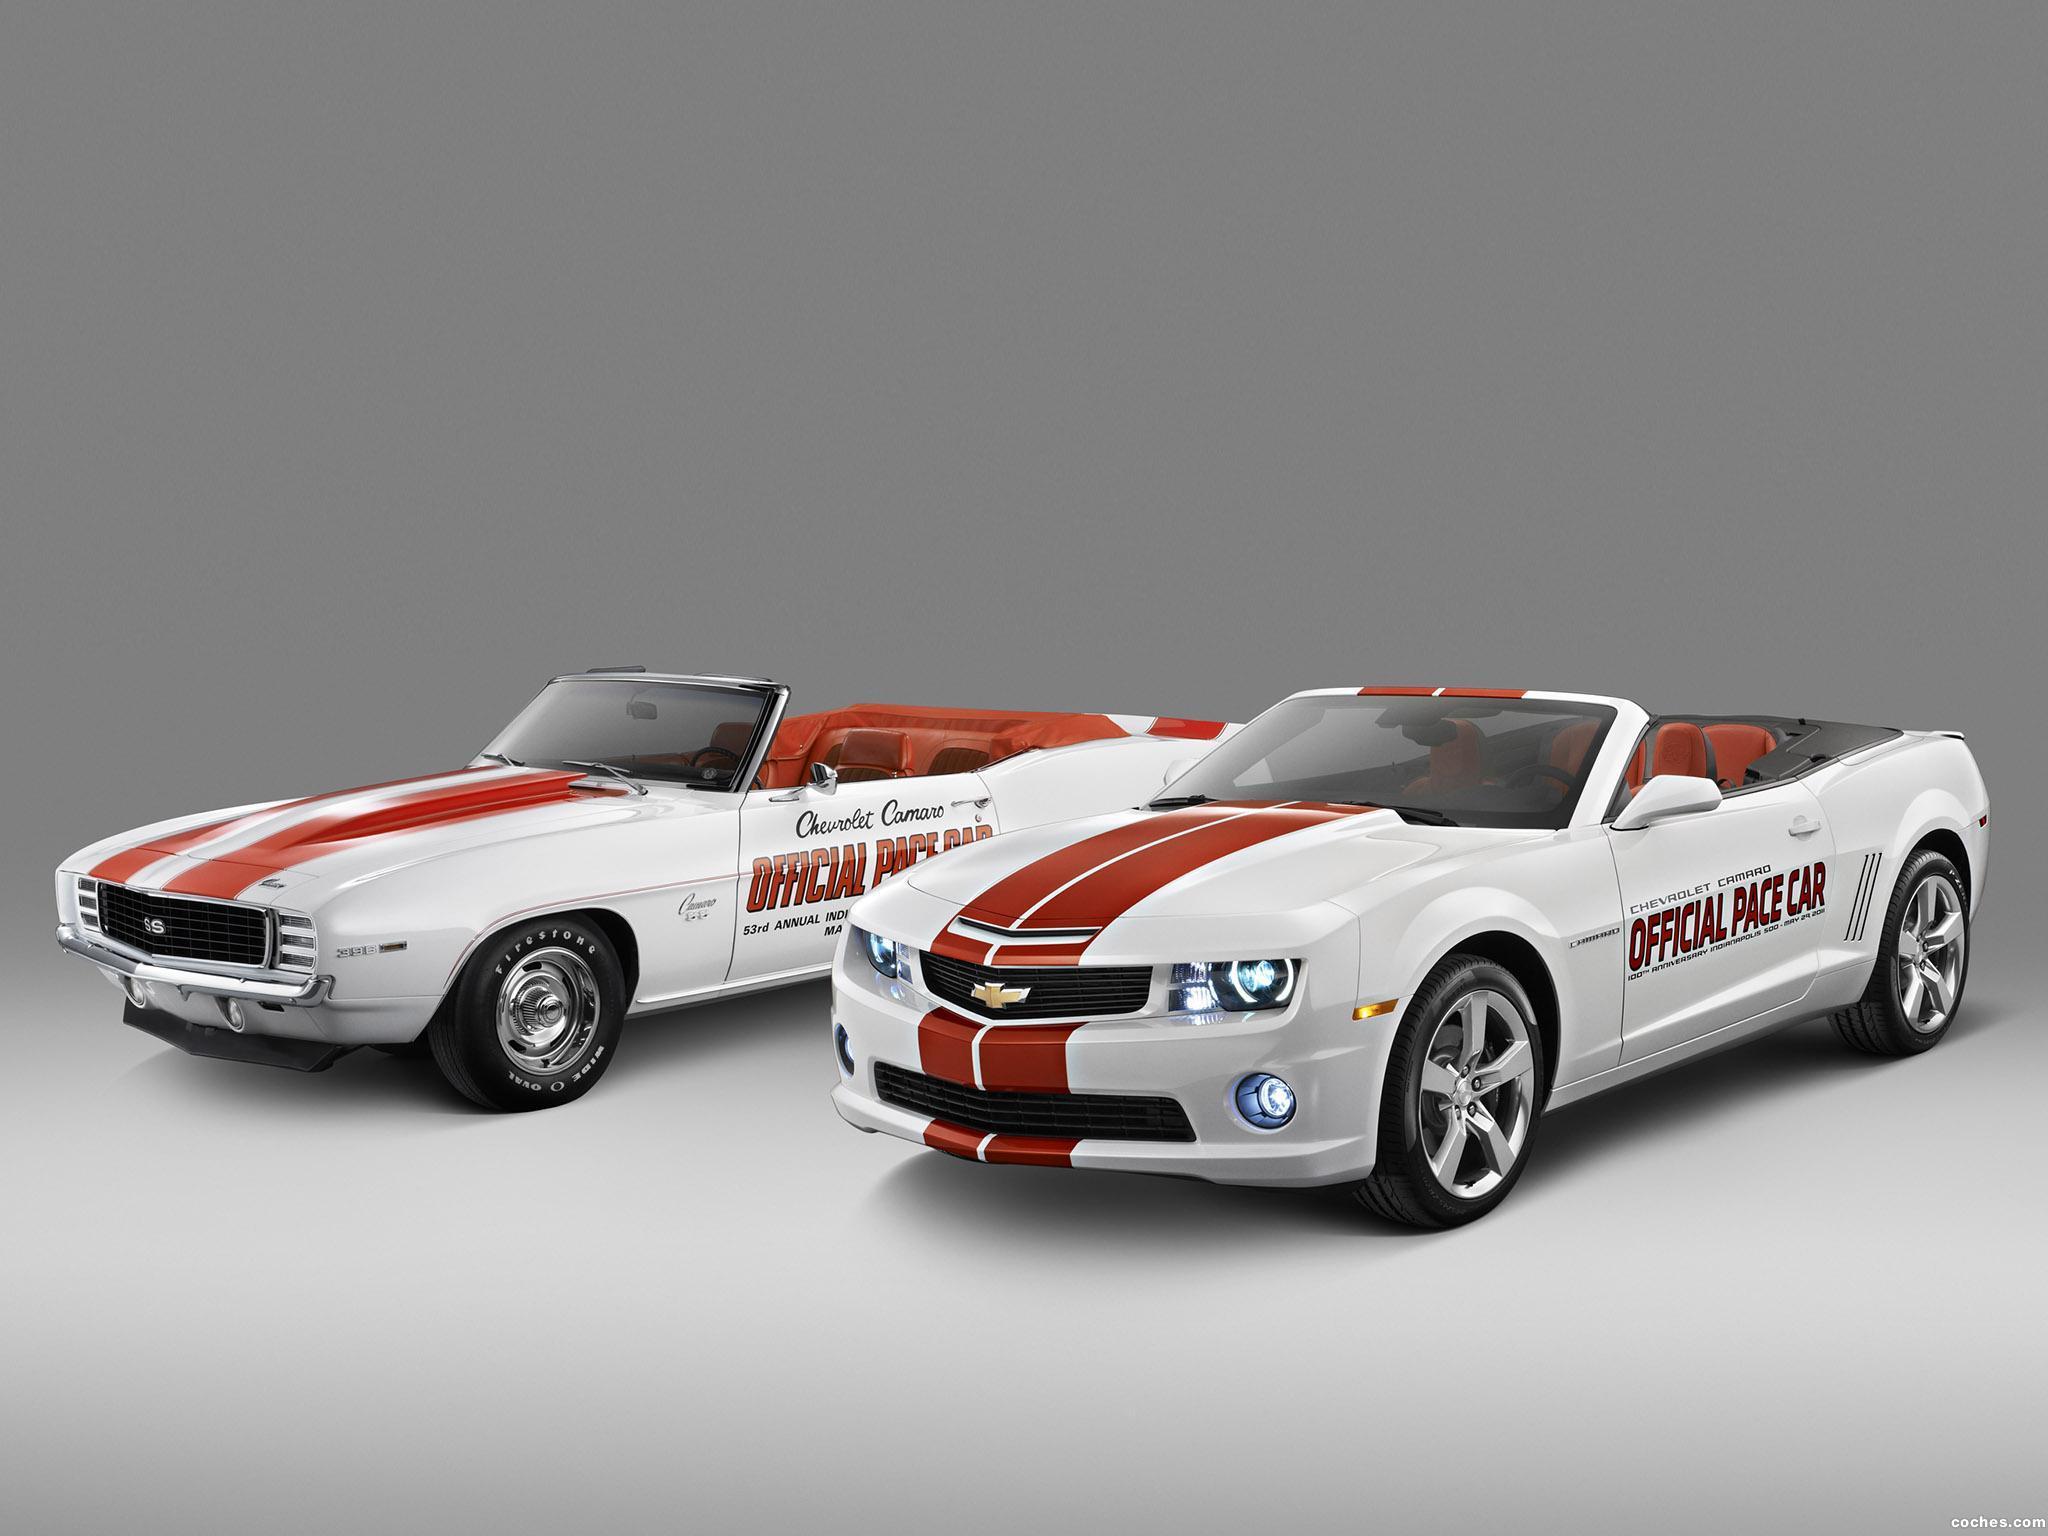 Foto 1 de Chevrolet Camaro Convertible Indy 500 Pace Car 2011